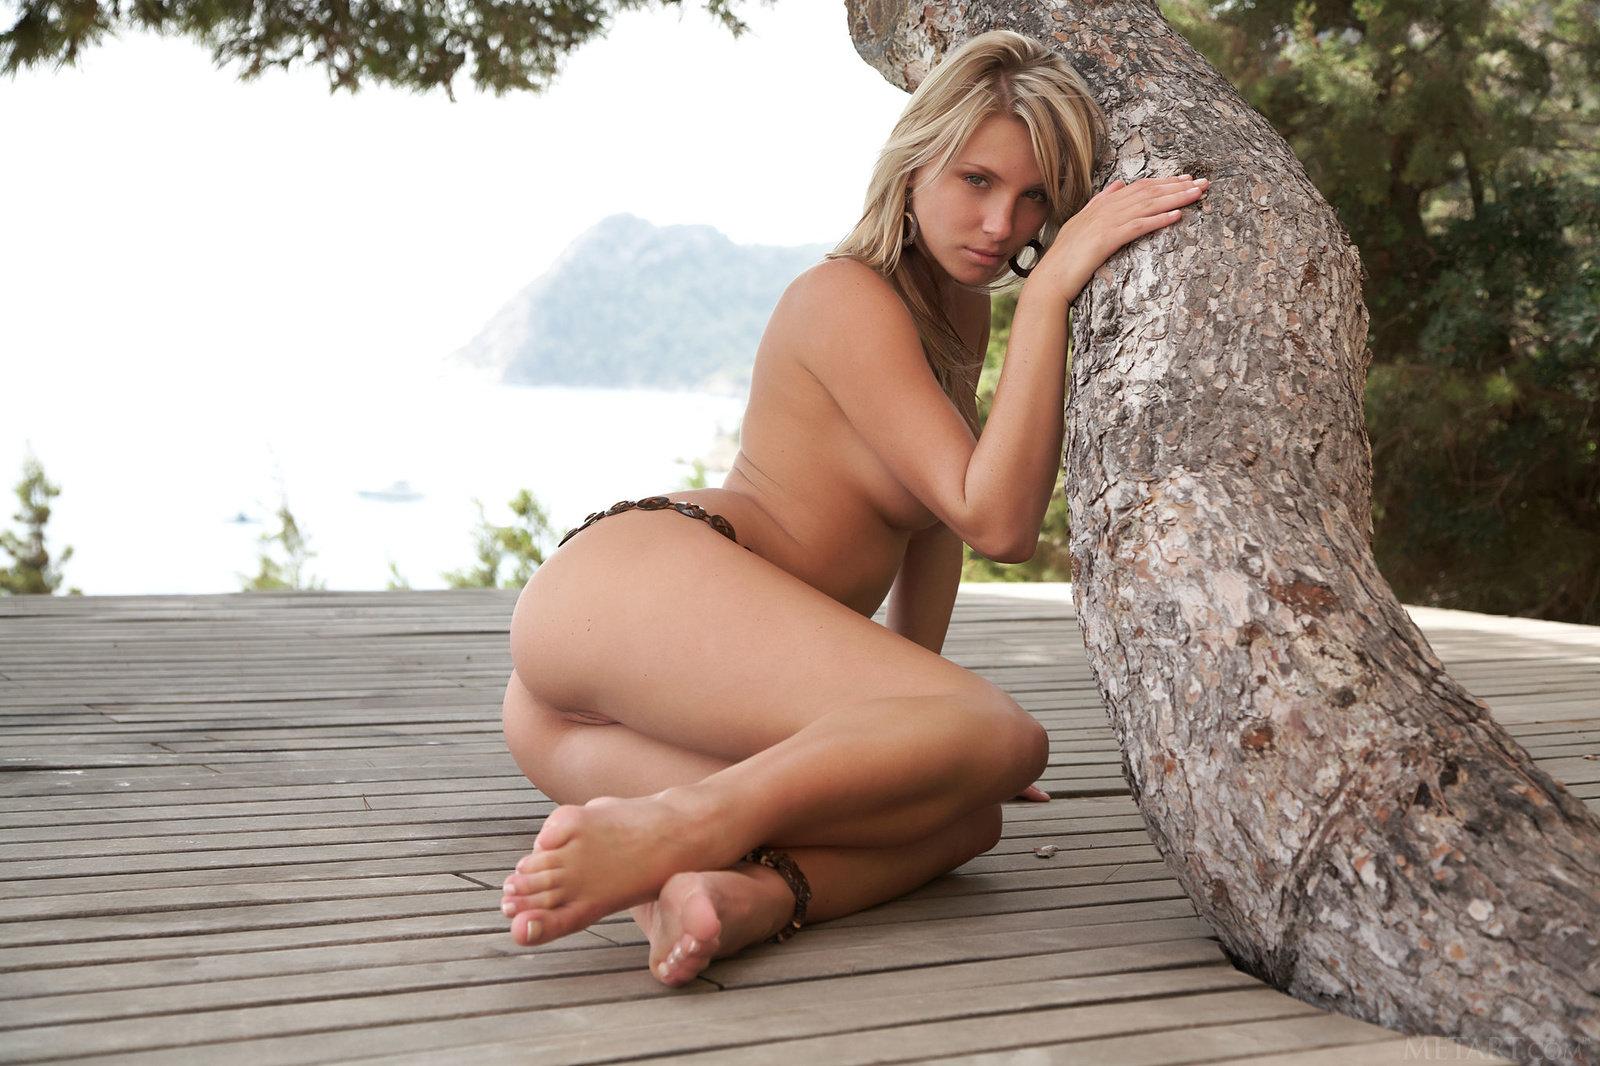 Met art danae Nude